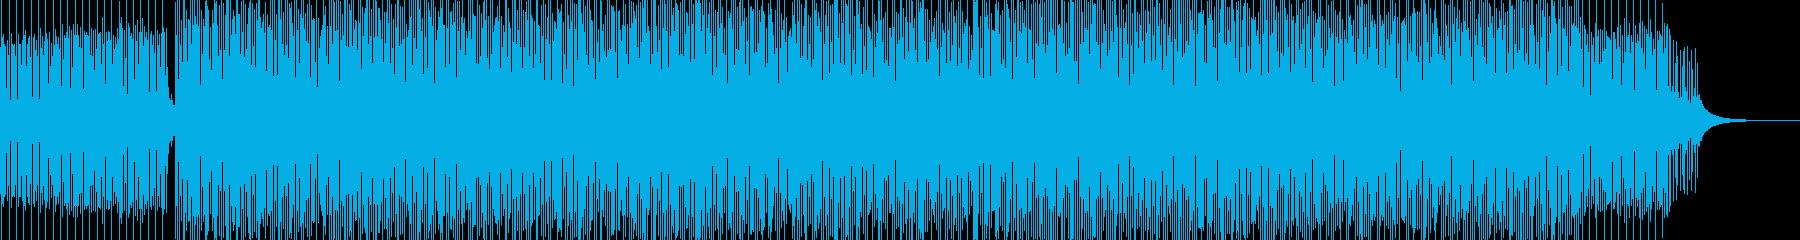 Rhodeピアノによるディープハウスの再生済みの波形